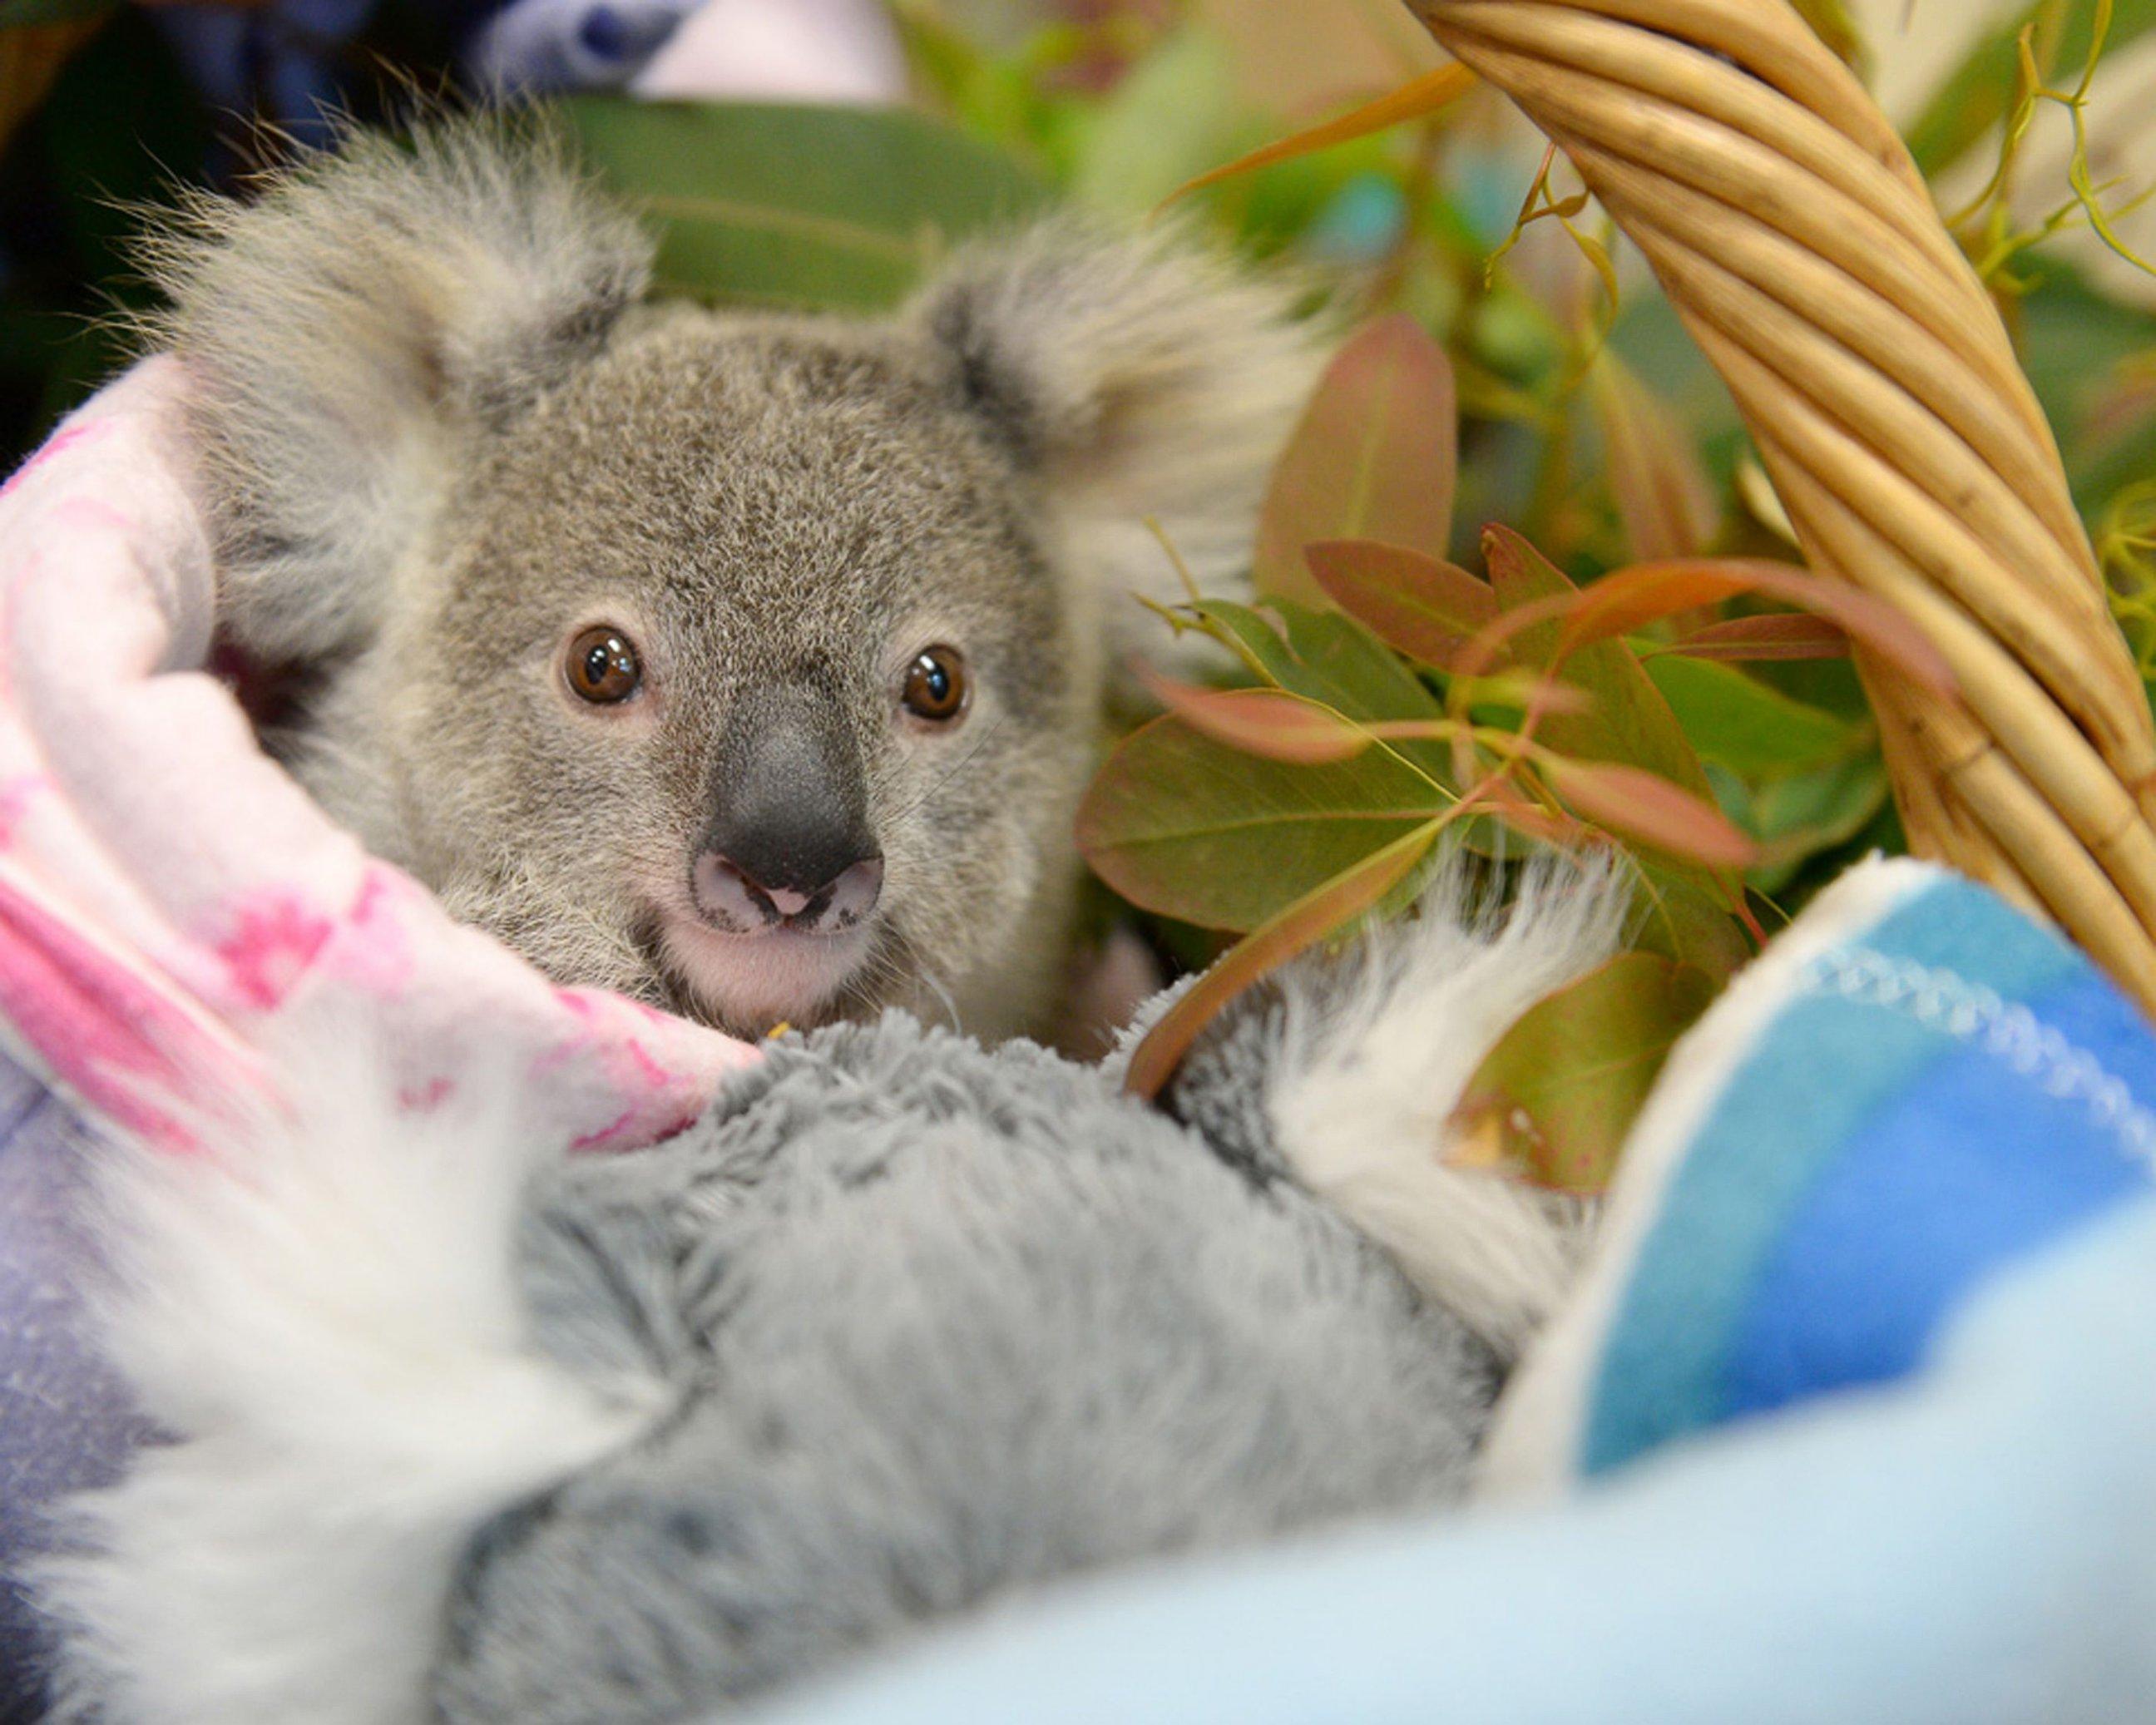 An Orphaned Baby Koala Cuddles a Fluffy Toy Koala